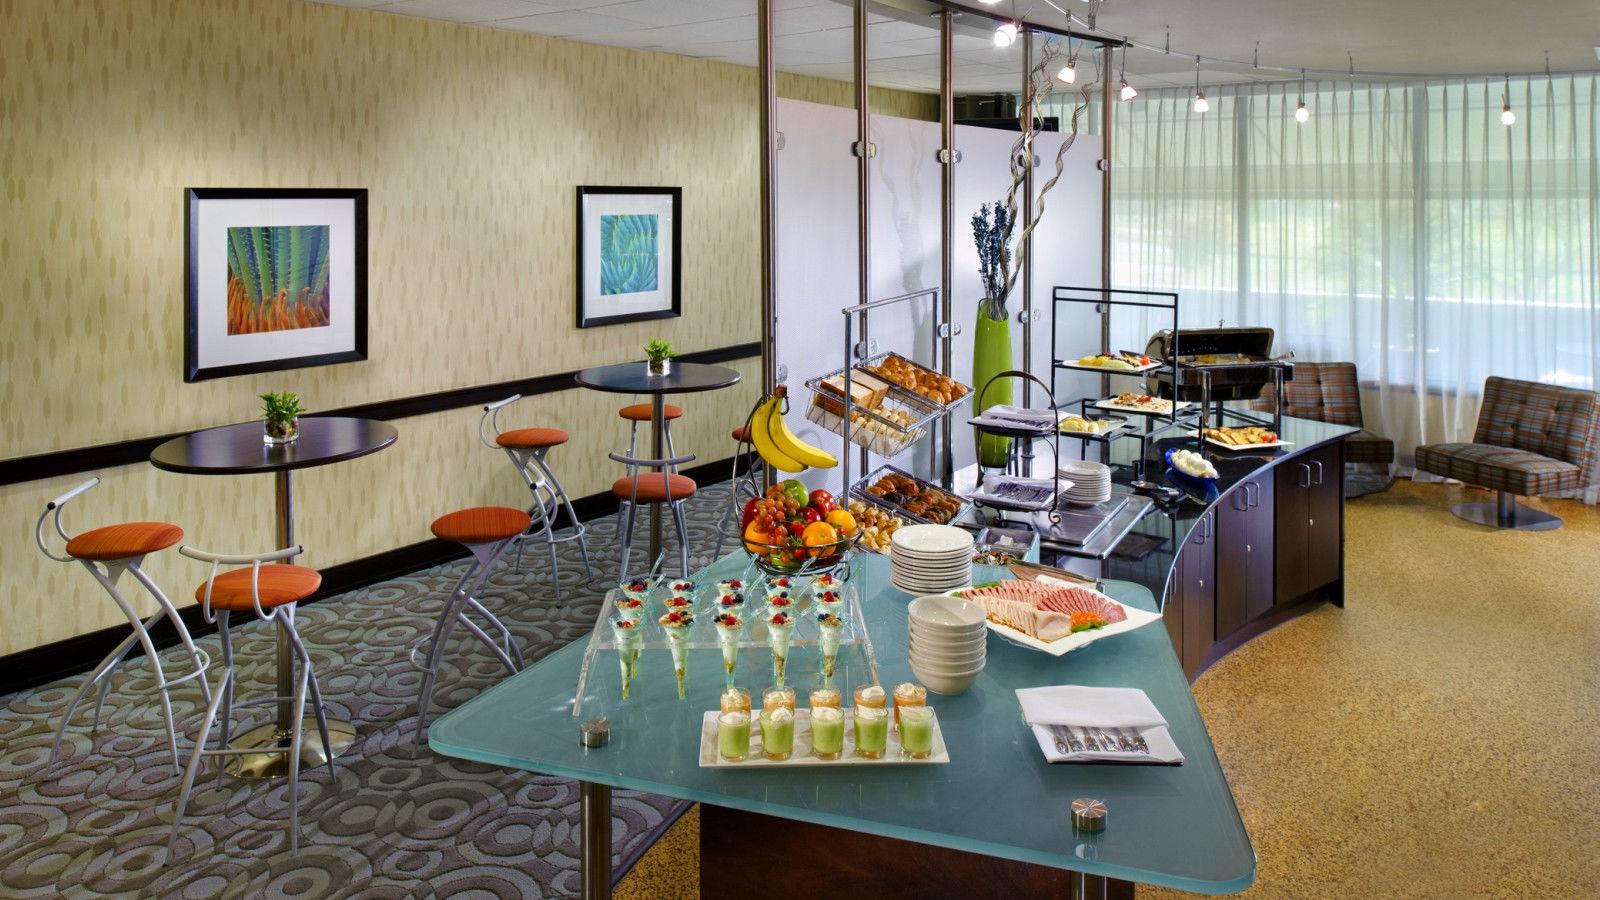 Sheraton Miami Airport Hotel & Executive Meeting Center image 16